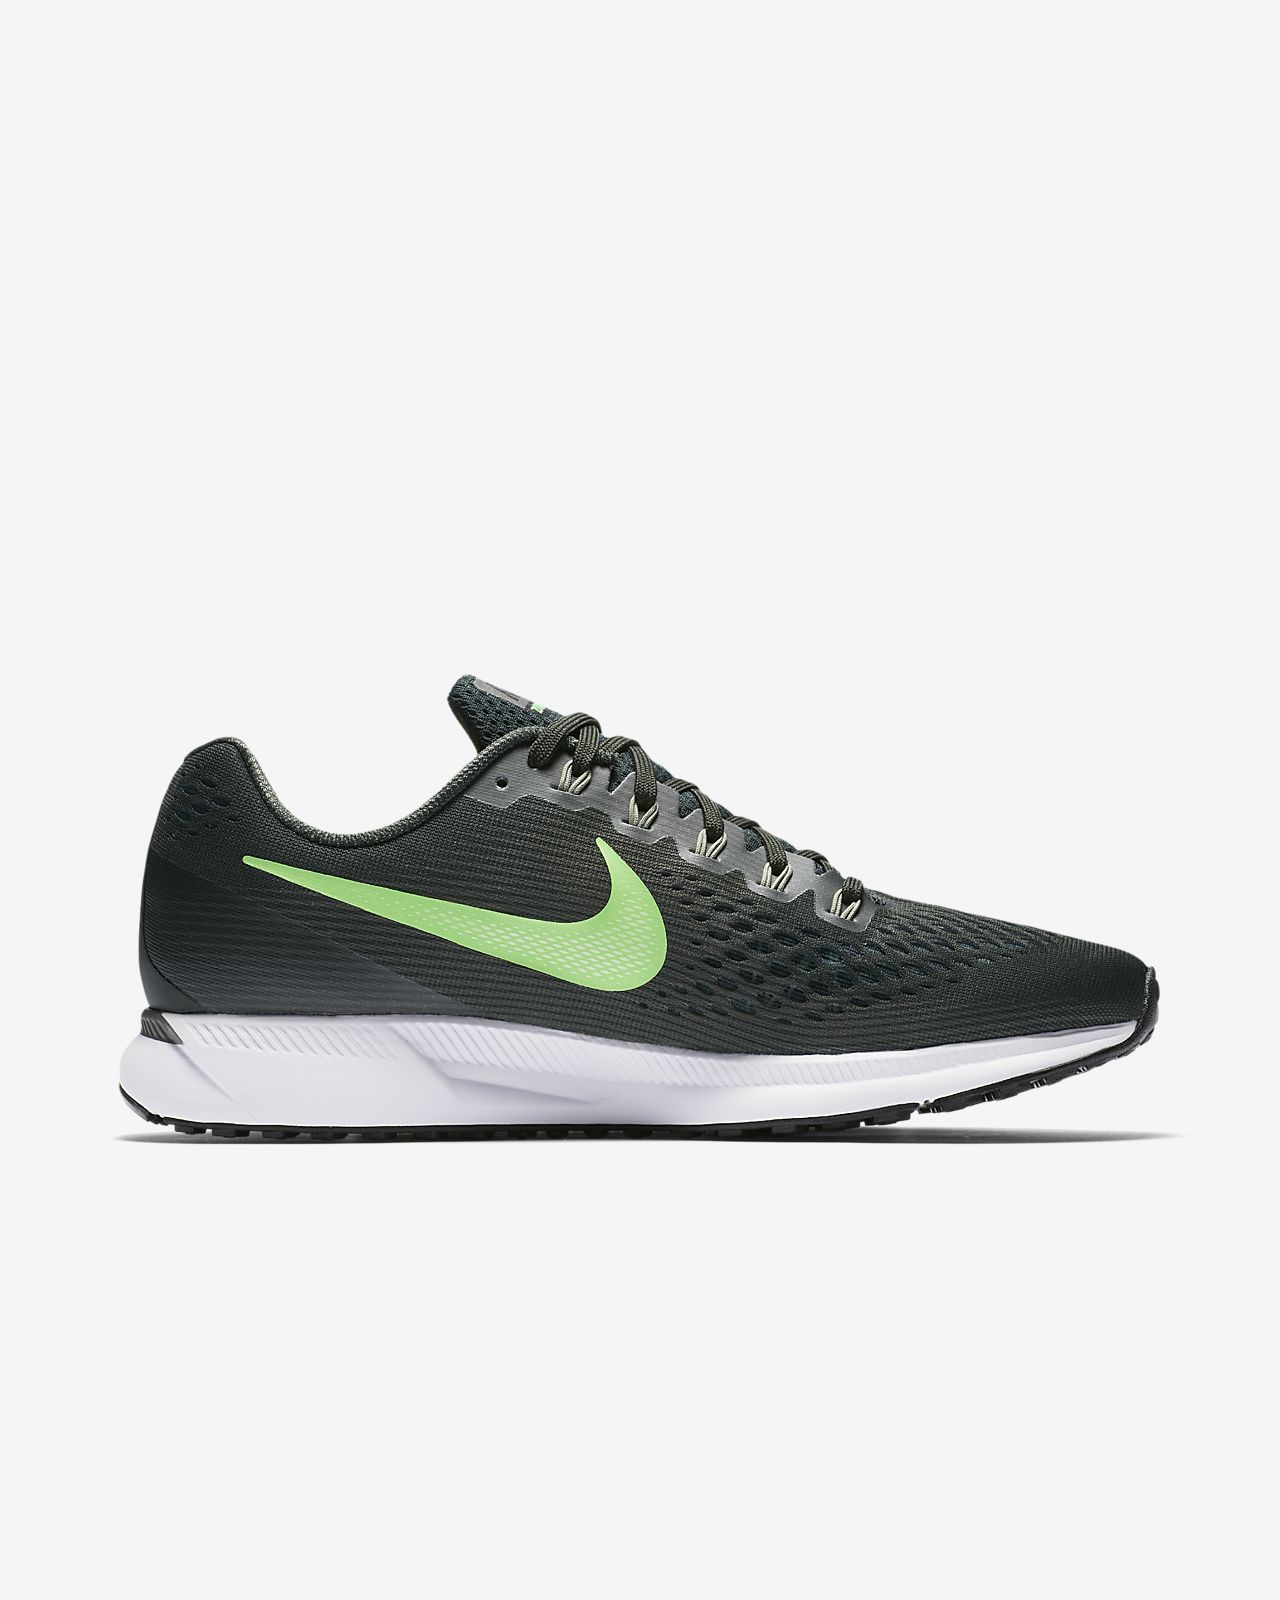 ... Nike Air Zoom Pegasus 34 Men's Running Shoe